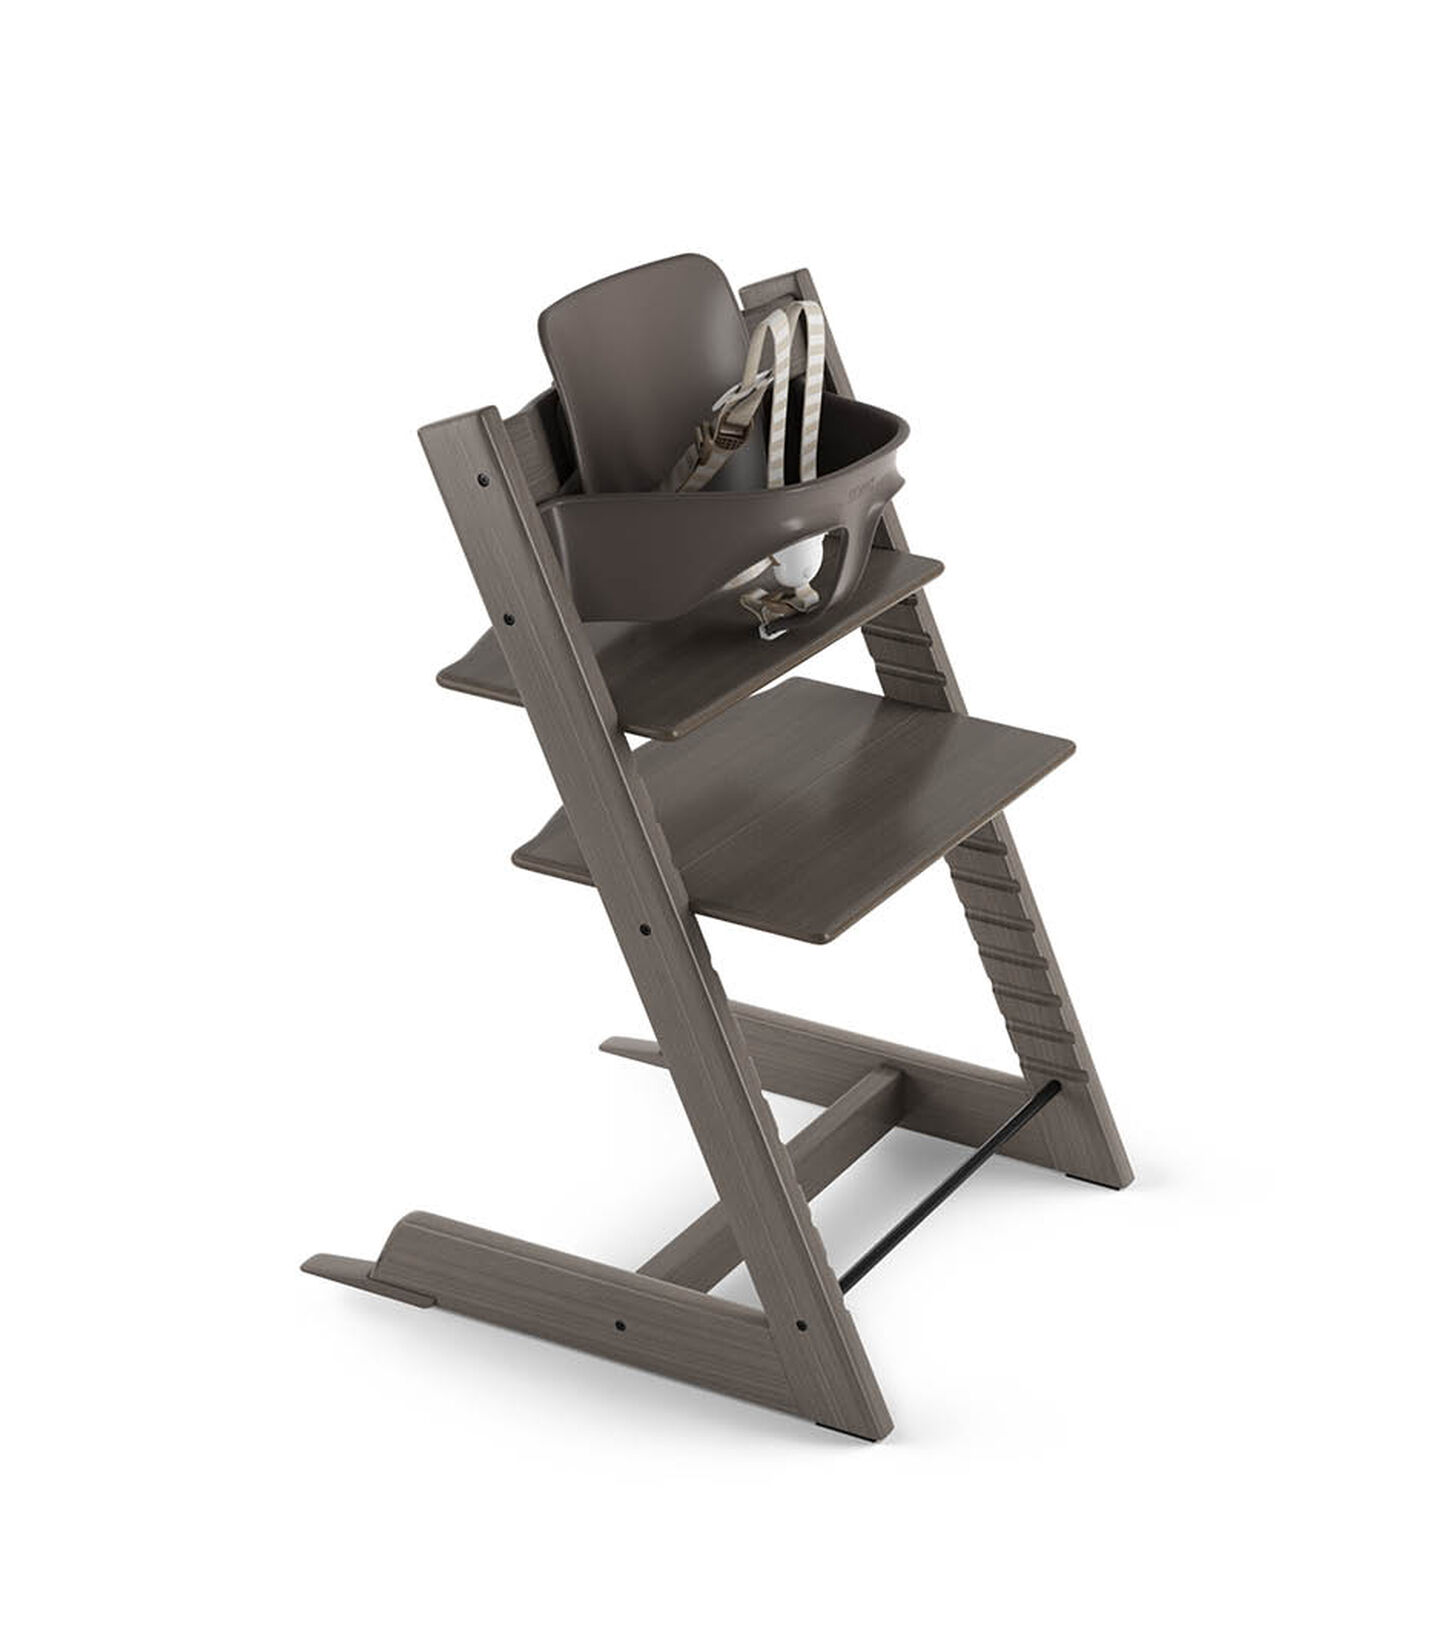 Tripp Trapp® Bundle High Chair US 18 Hazy Grey, Hazy Grey, mainview view 2